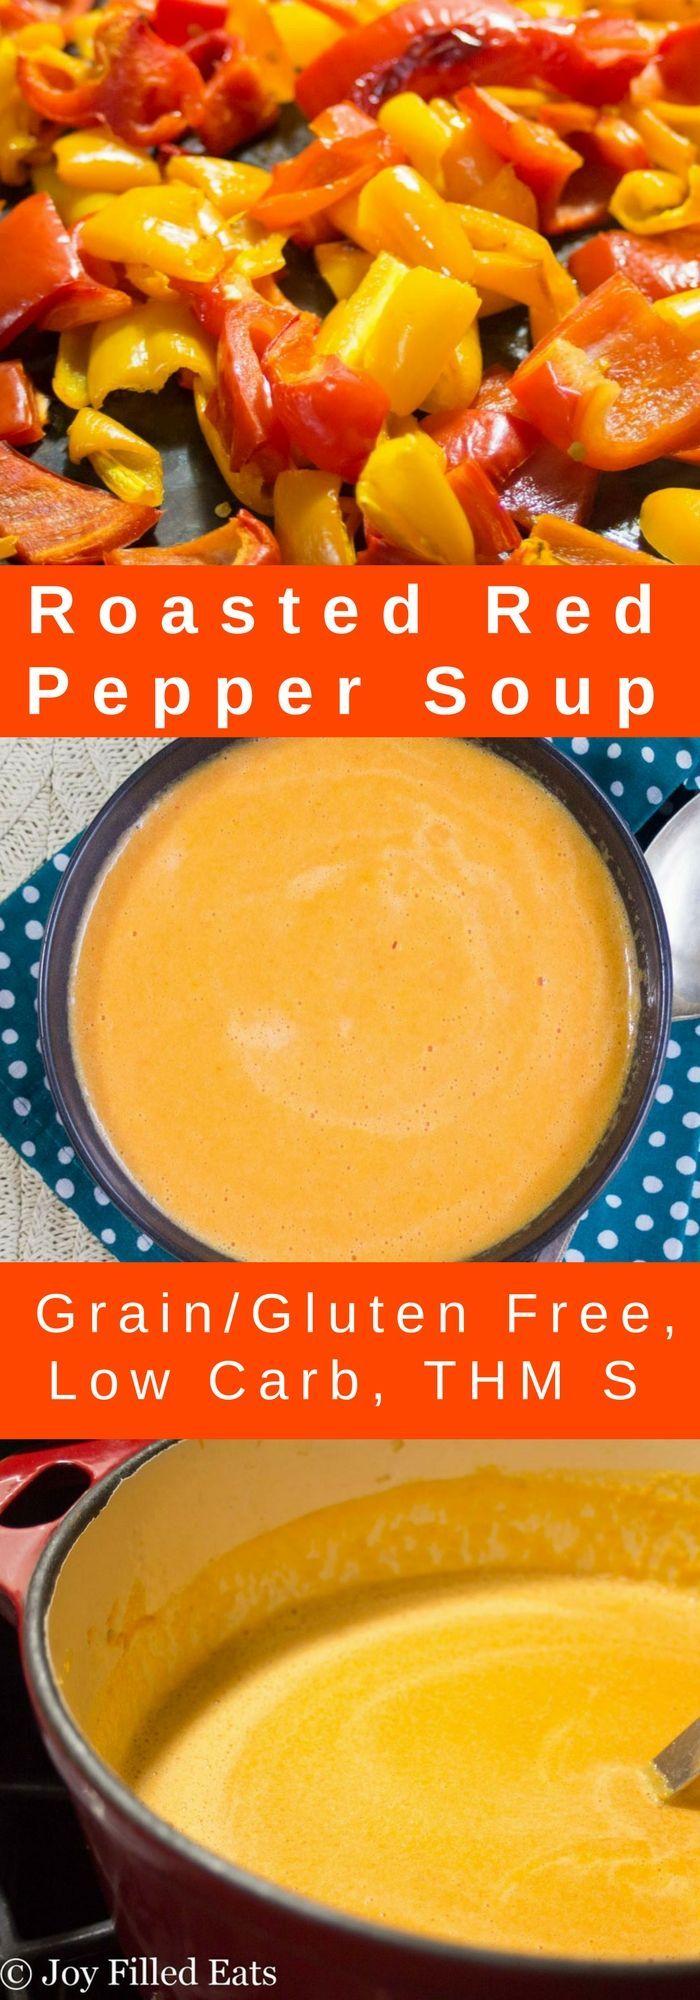 Roasted Red Pepper Soup - Low Carb, Grain/Gluten Free, THM S via @joyfilledeats